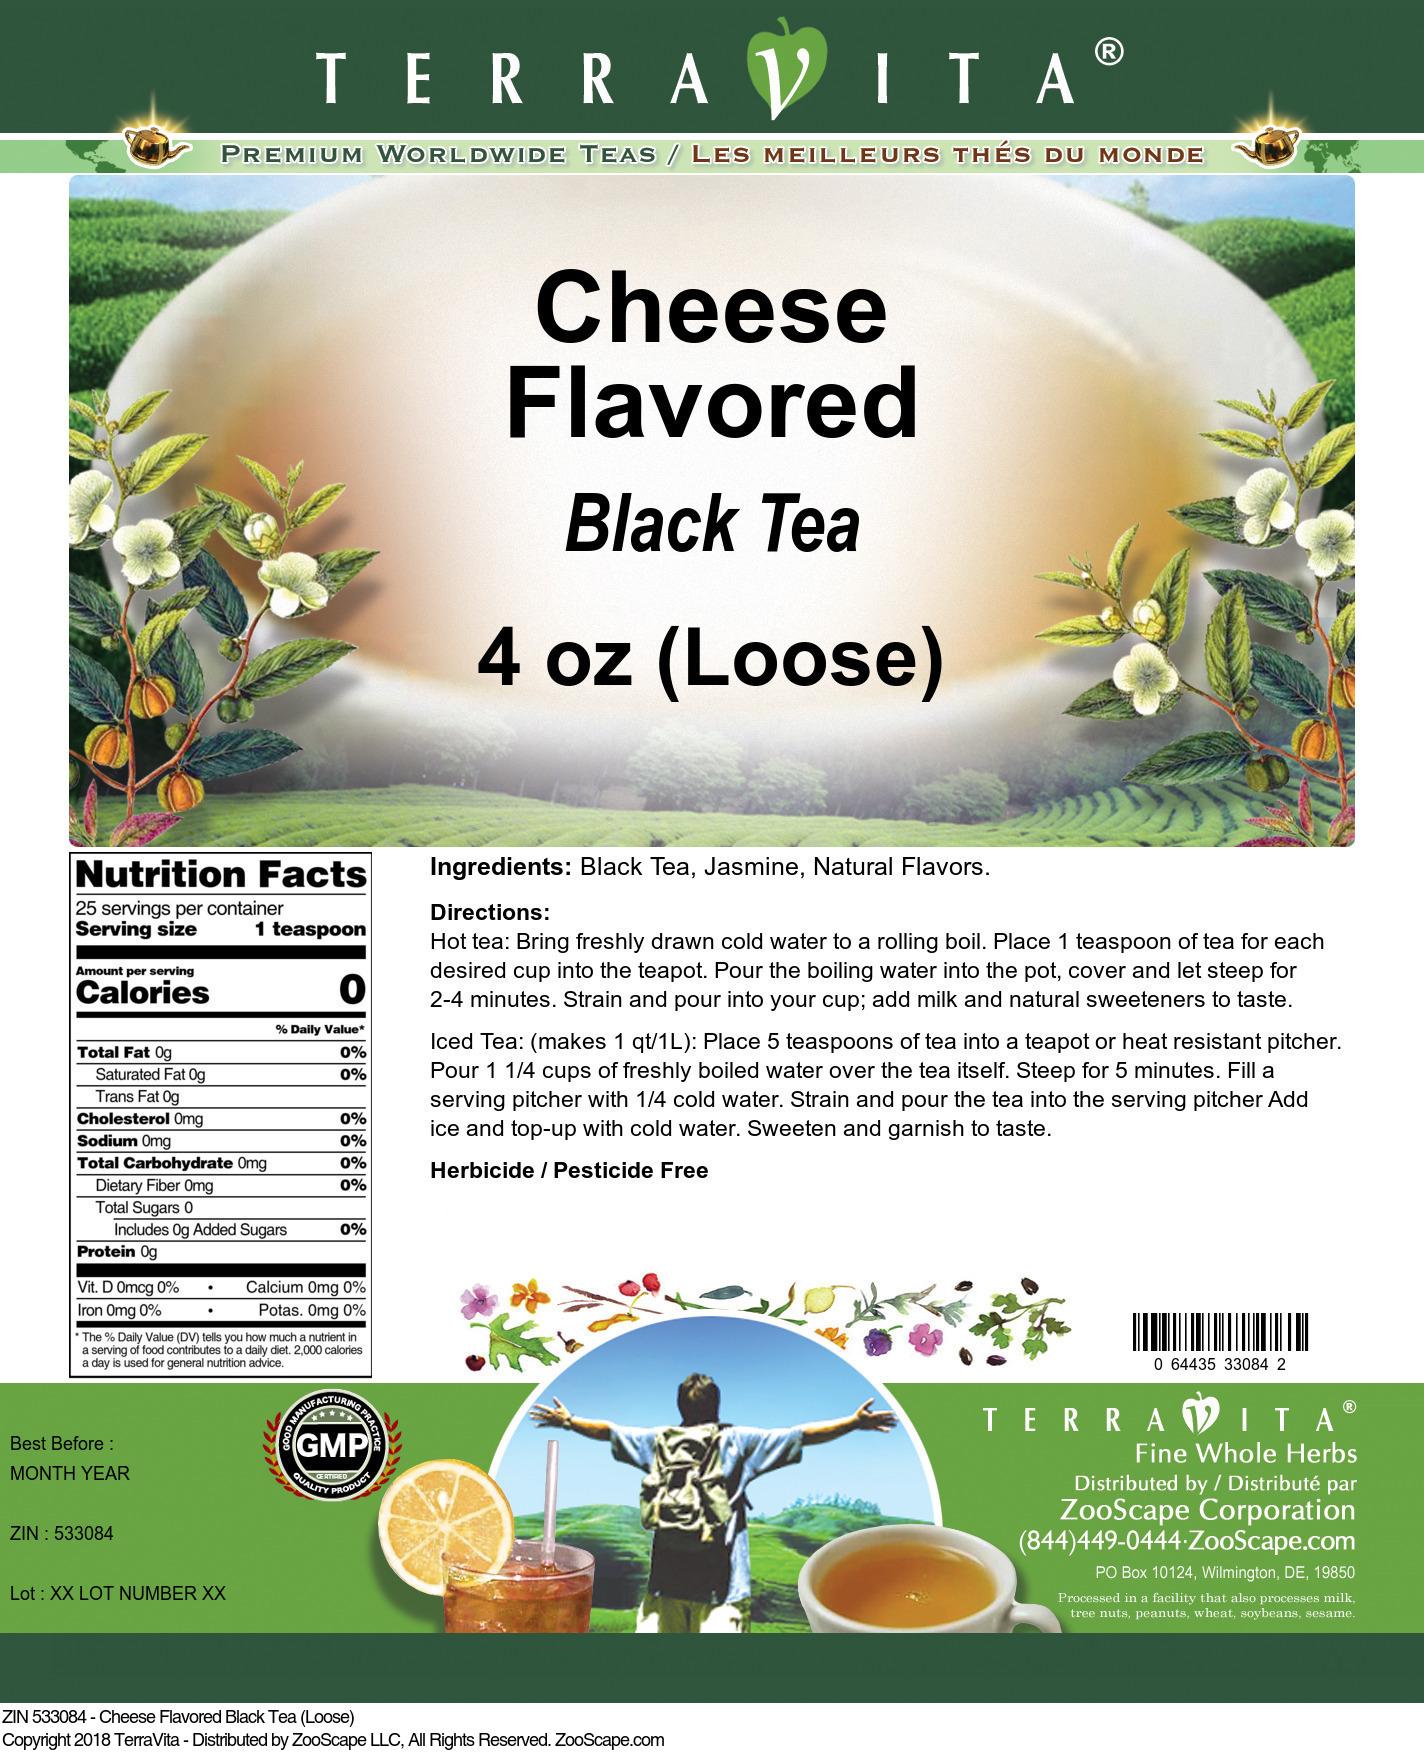 Cheese Flavored Black Tea